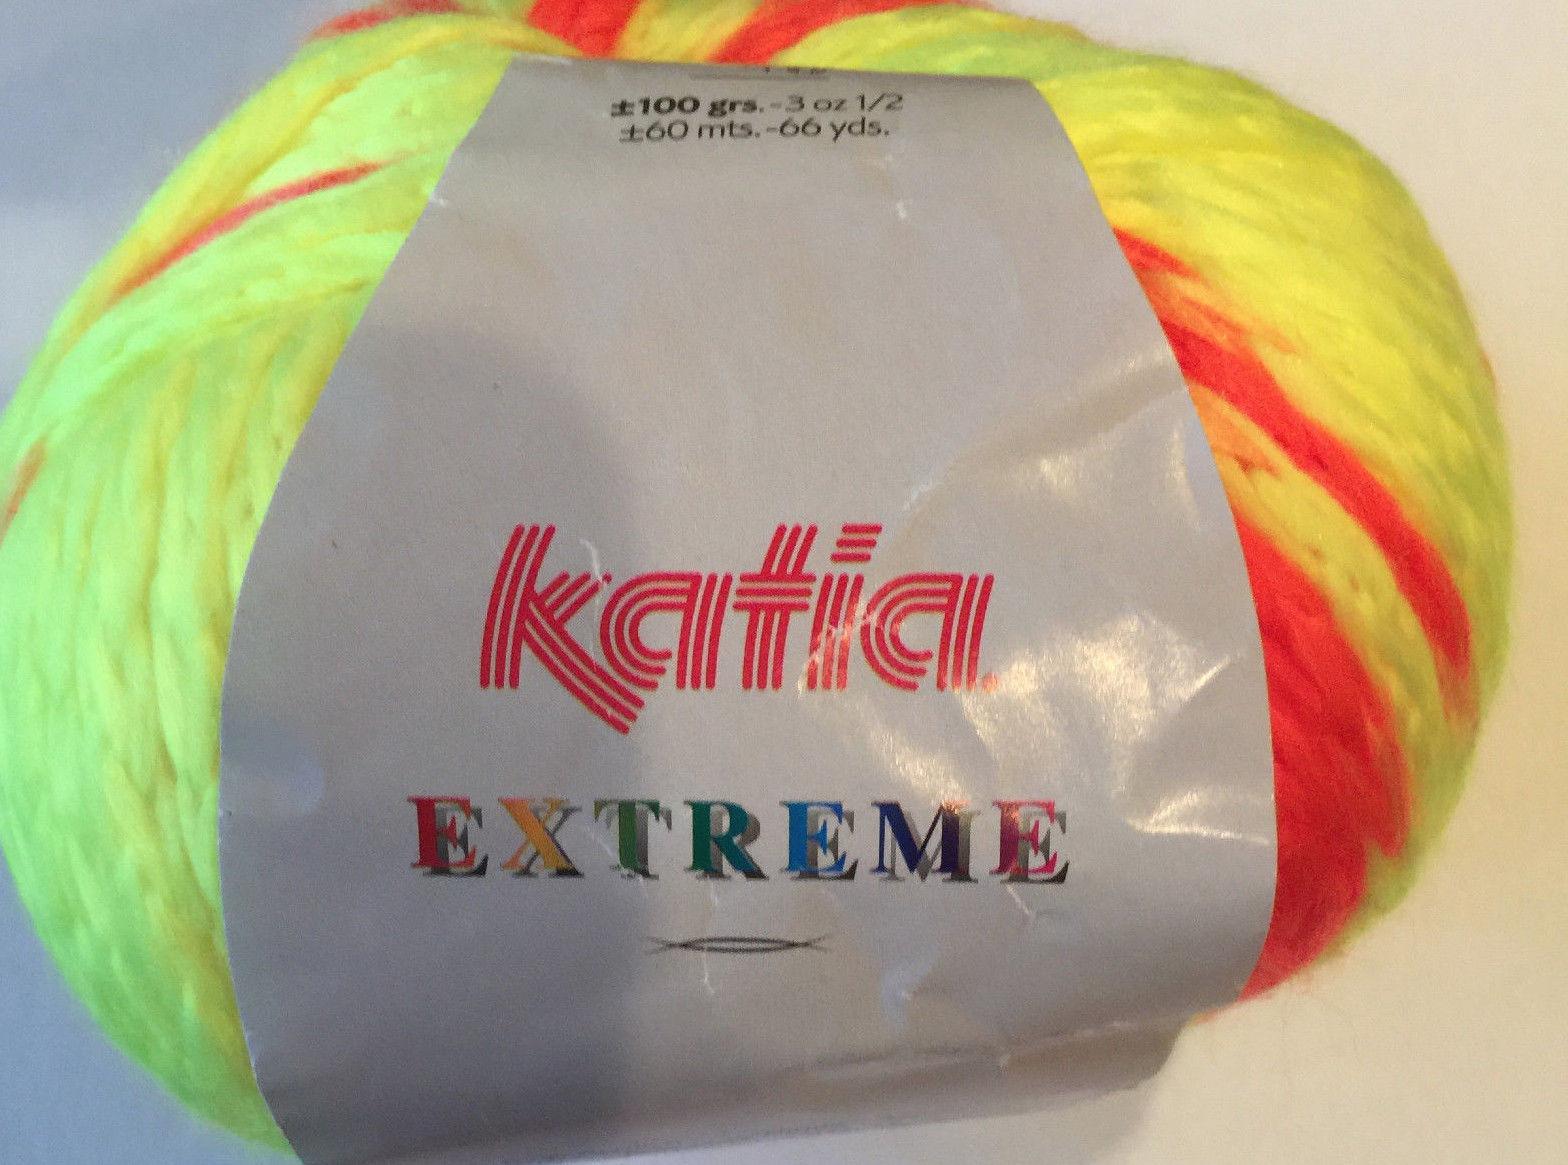 Extreme - Acrylic Polyamide Yarn by Katia